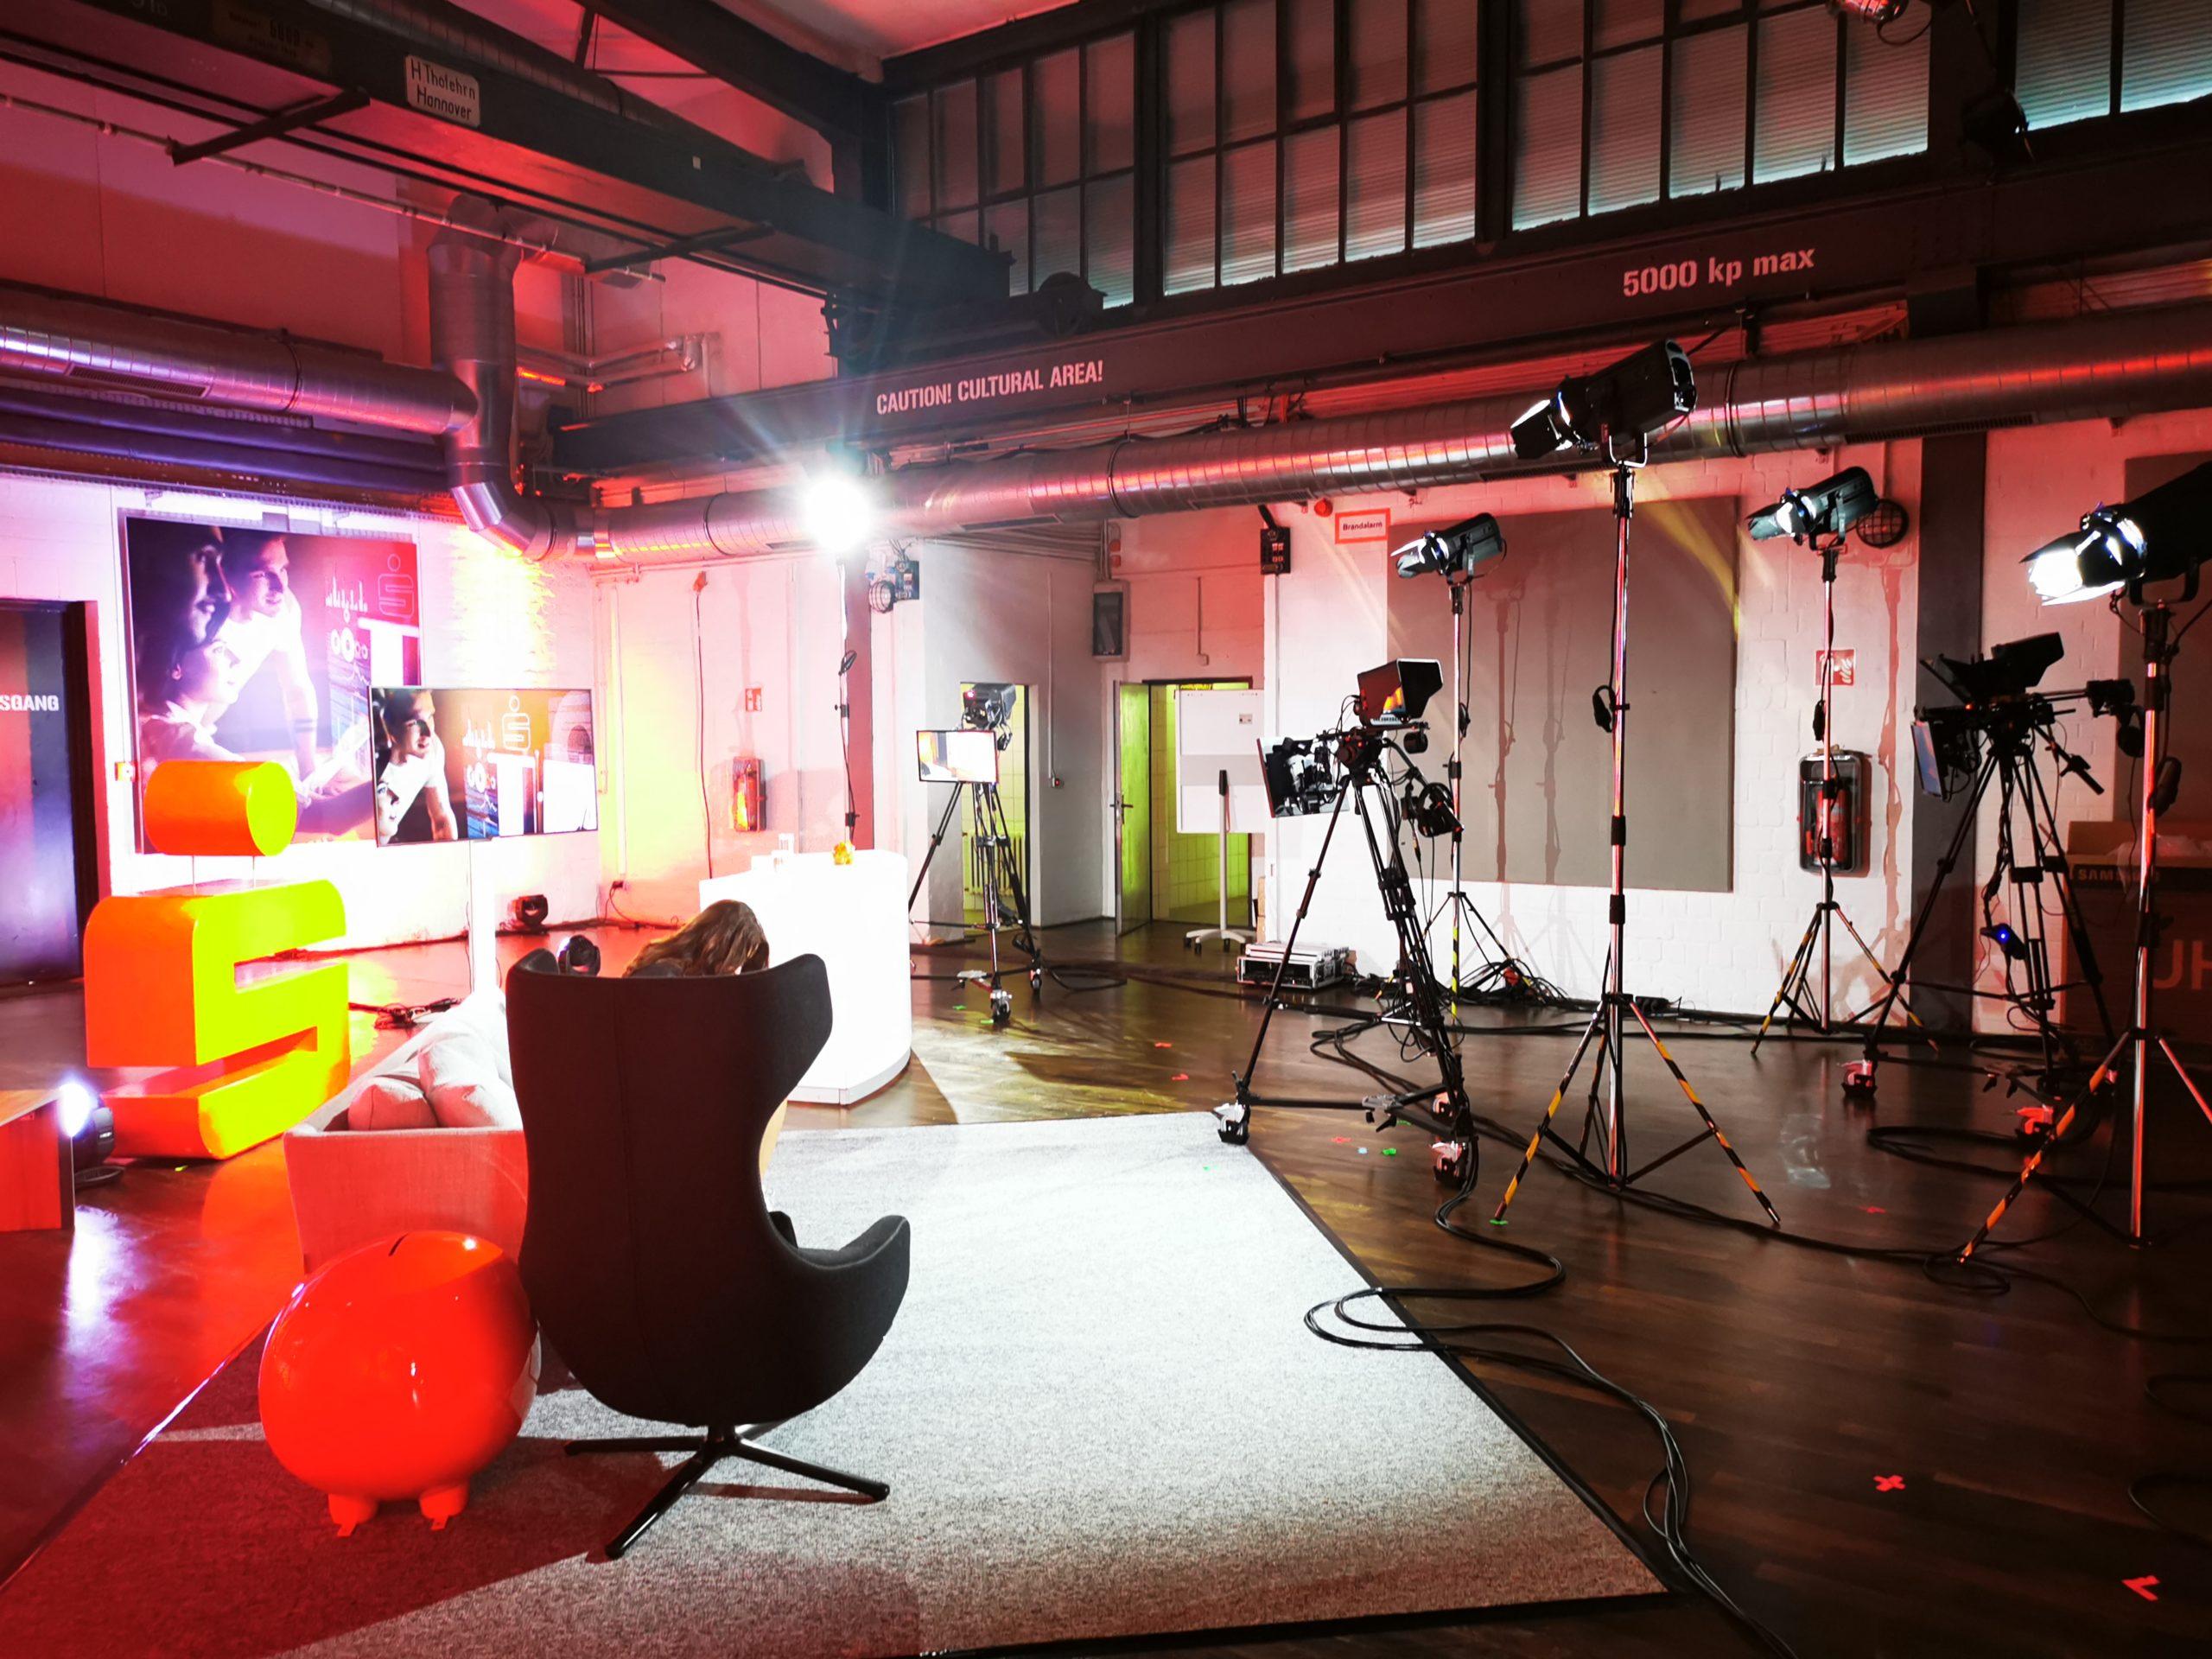 TMP Sparkasse Celle Gifhorn Wolfsburg Filmstudio hybrid event